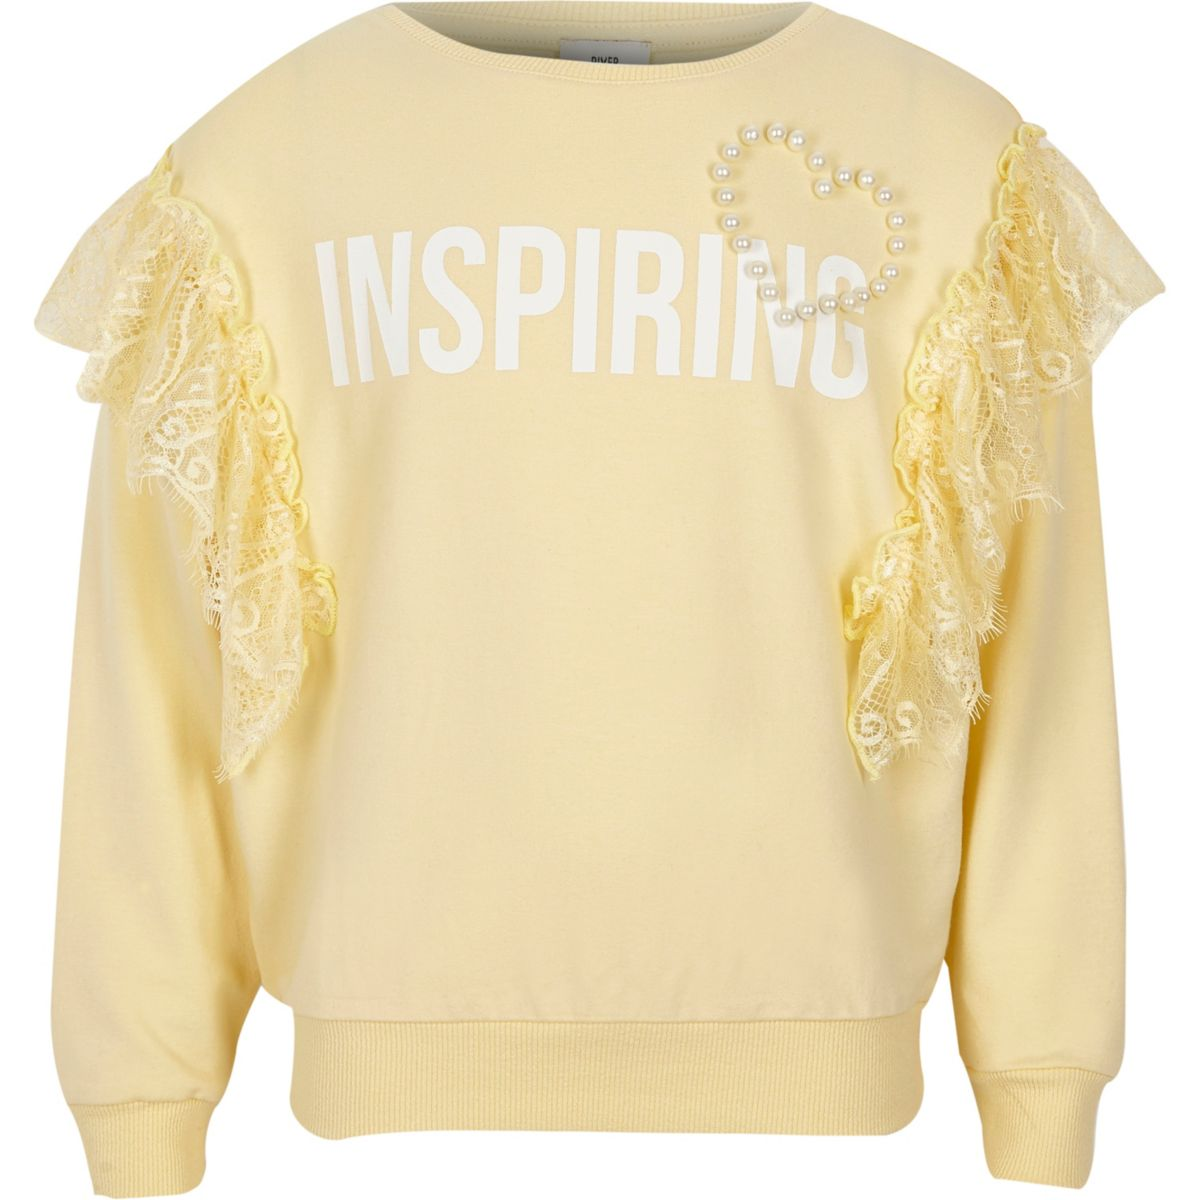 Girls yellow 'inspiring' lace trim sweatshirt